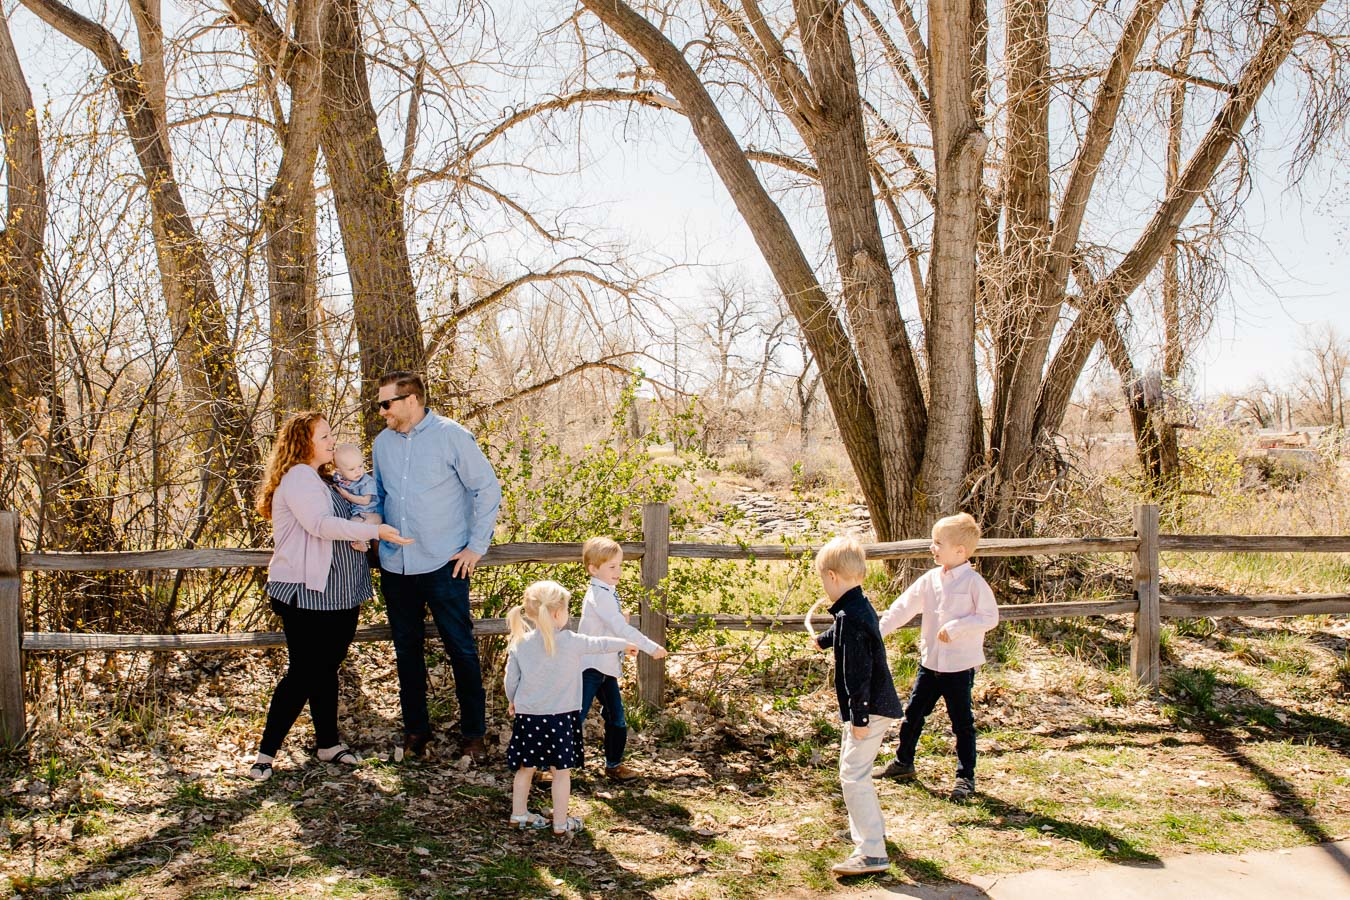 Denver Family Photographer {Shulz Spring Family Colorado Photos} By Brittany | Denver Colorado Lifestyle Family Photos